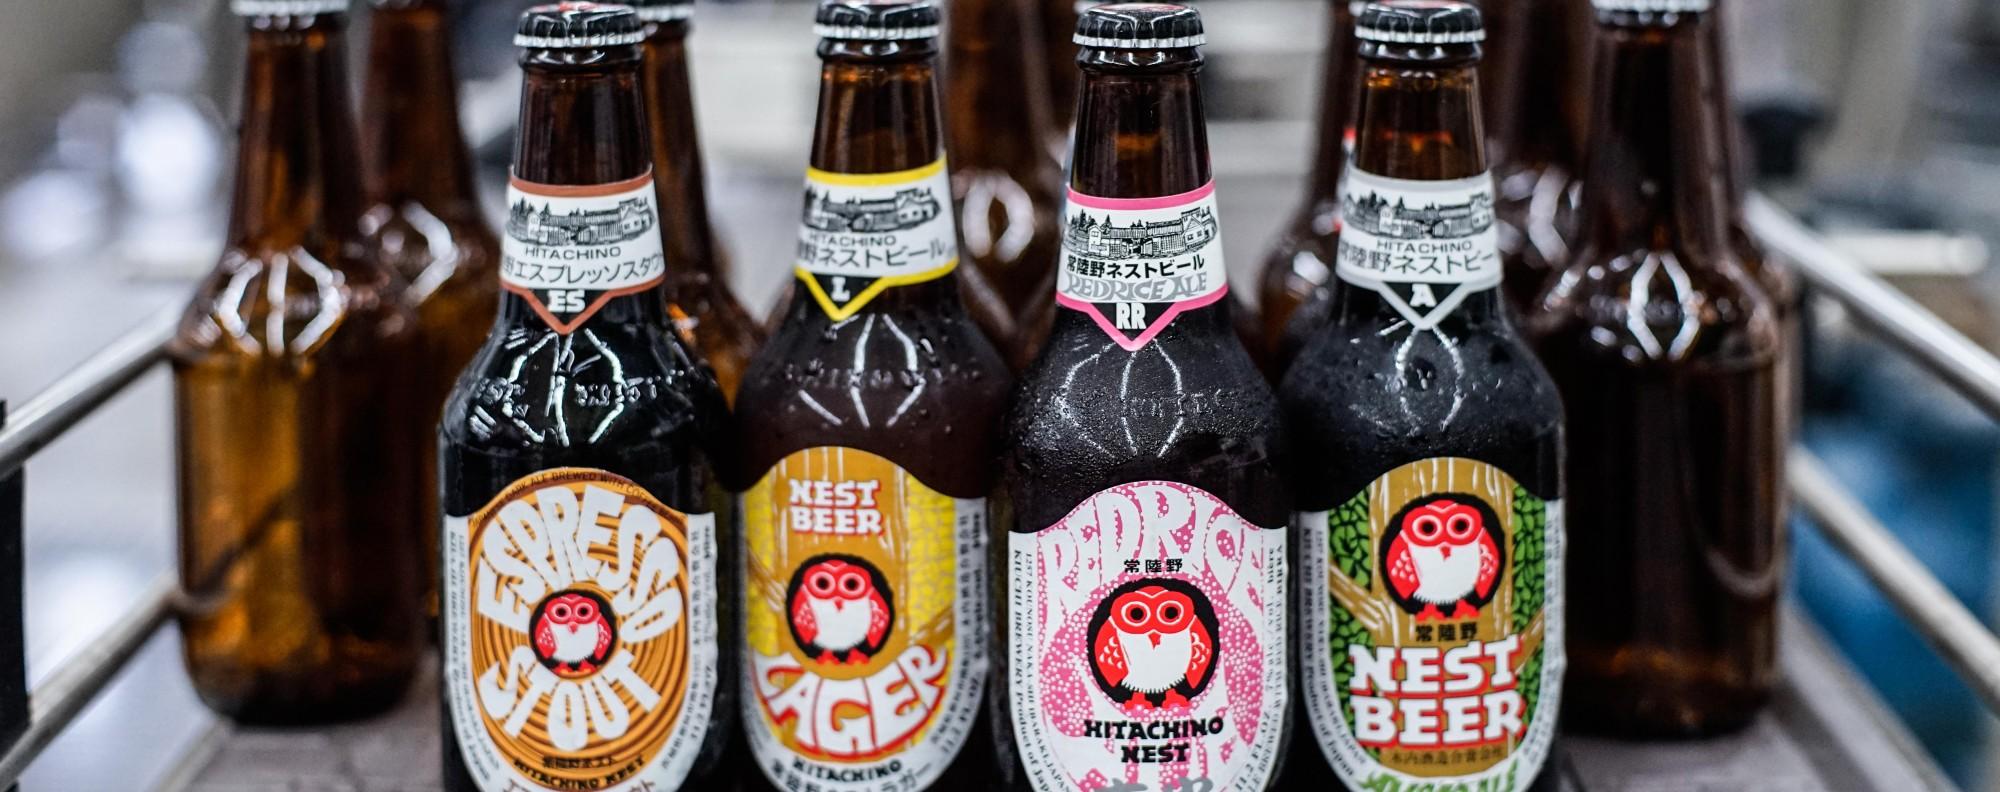 Beer cult 93